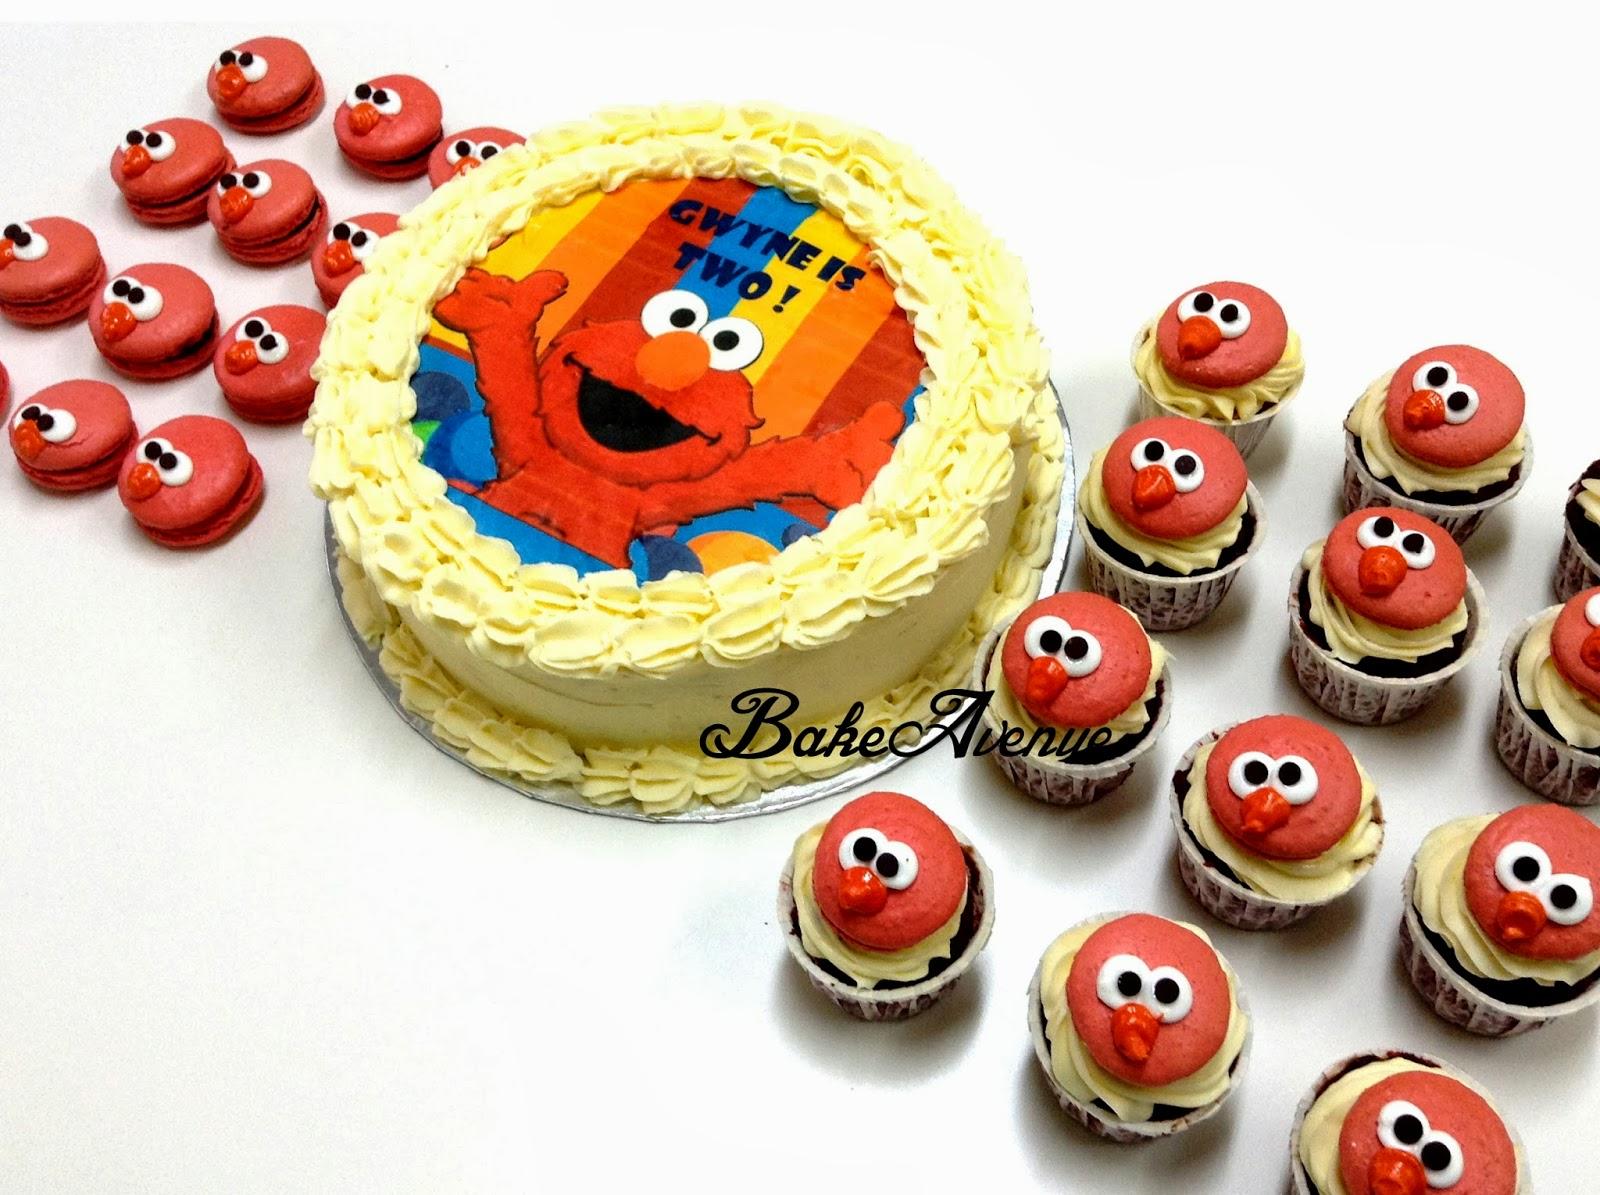 Elmo Theme Red Velvet Cake and macarons cupcakes